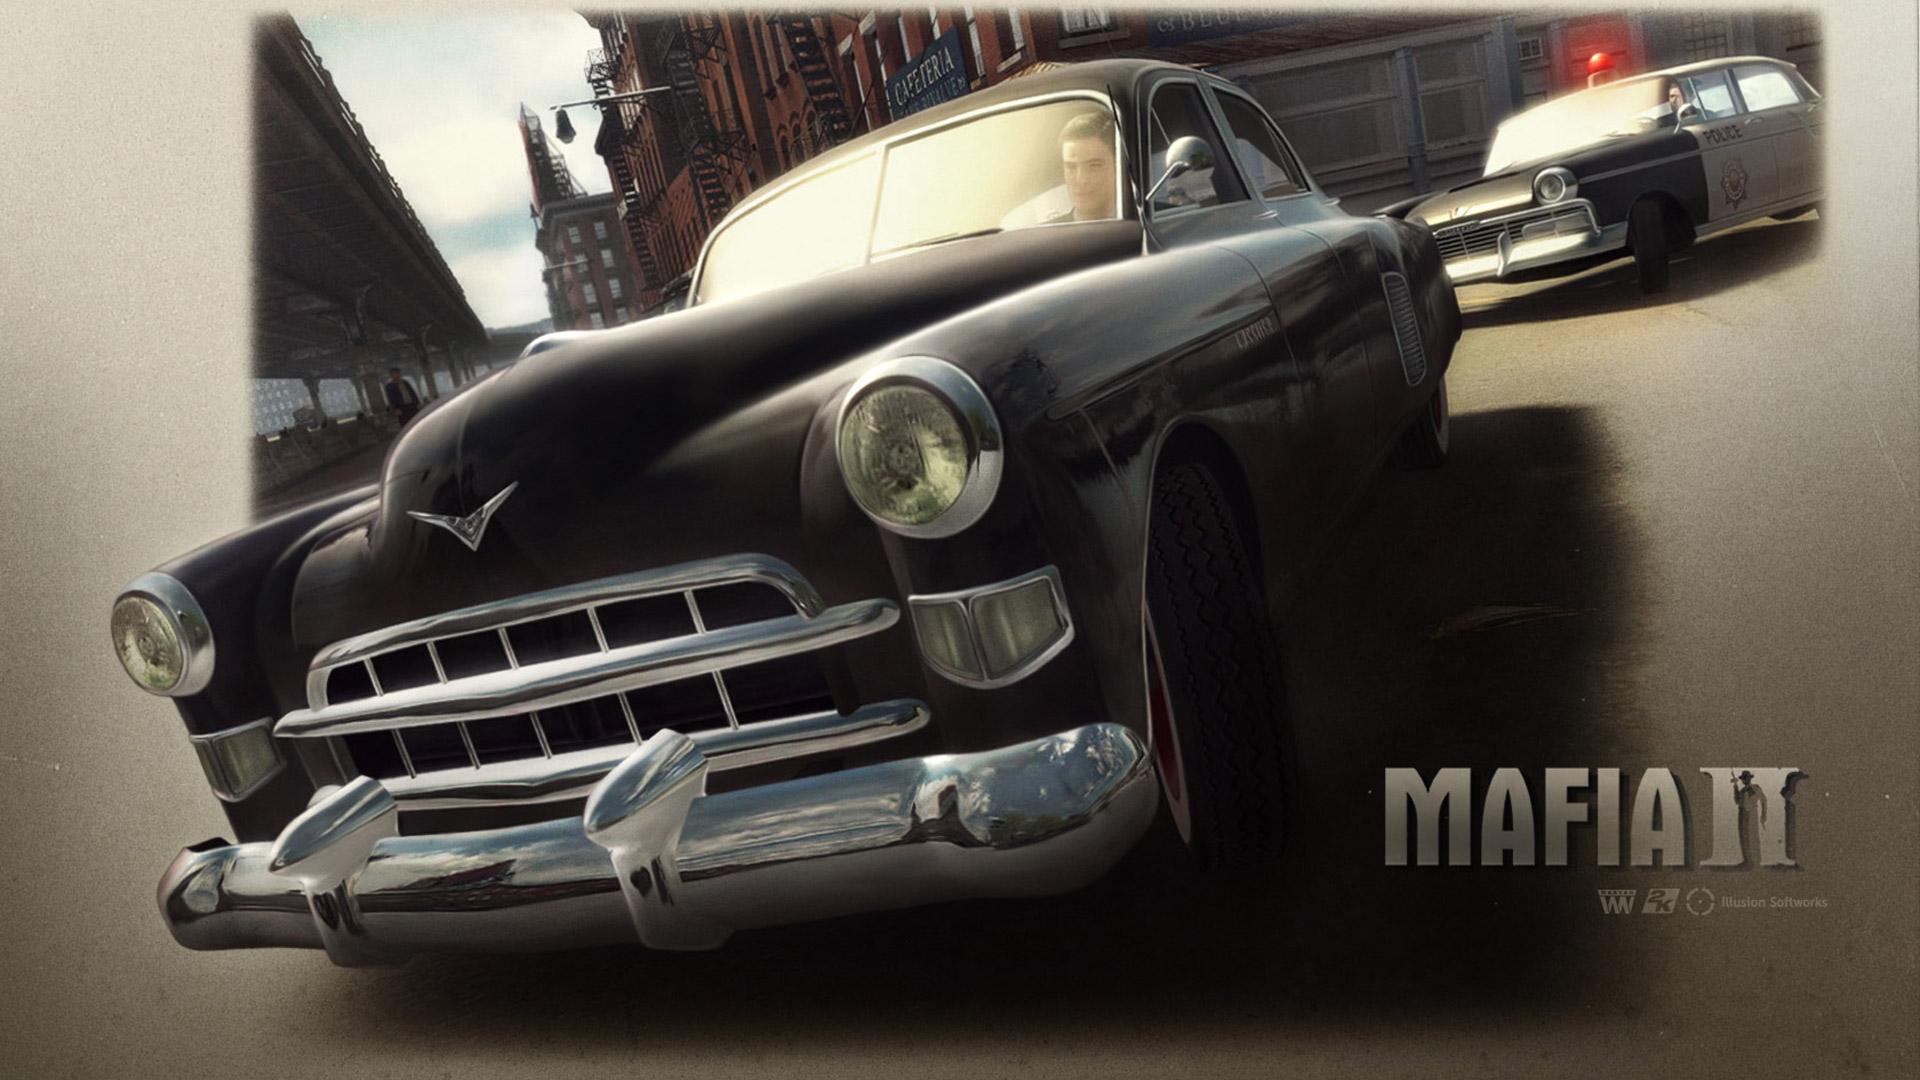 Free Mafia II Wallpaper in 1920x1080